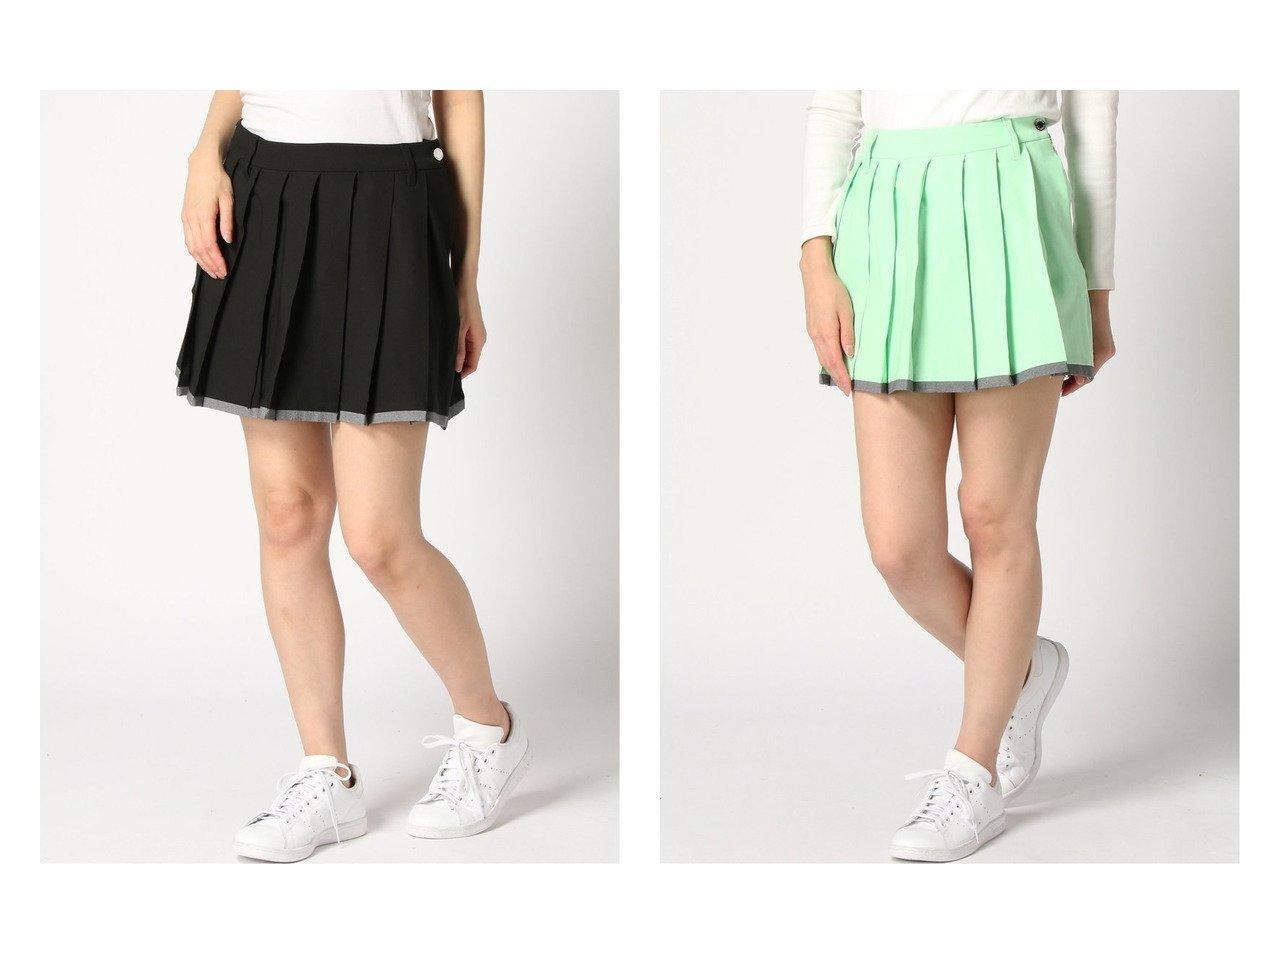 【DESCENTE GOLF/デサントゴルフ】のプリーツ スカート 【スカート】おすすめ!人気、トレンド・レディースファッションの通販    レディースファッション・服の通販 founy(ファニー)